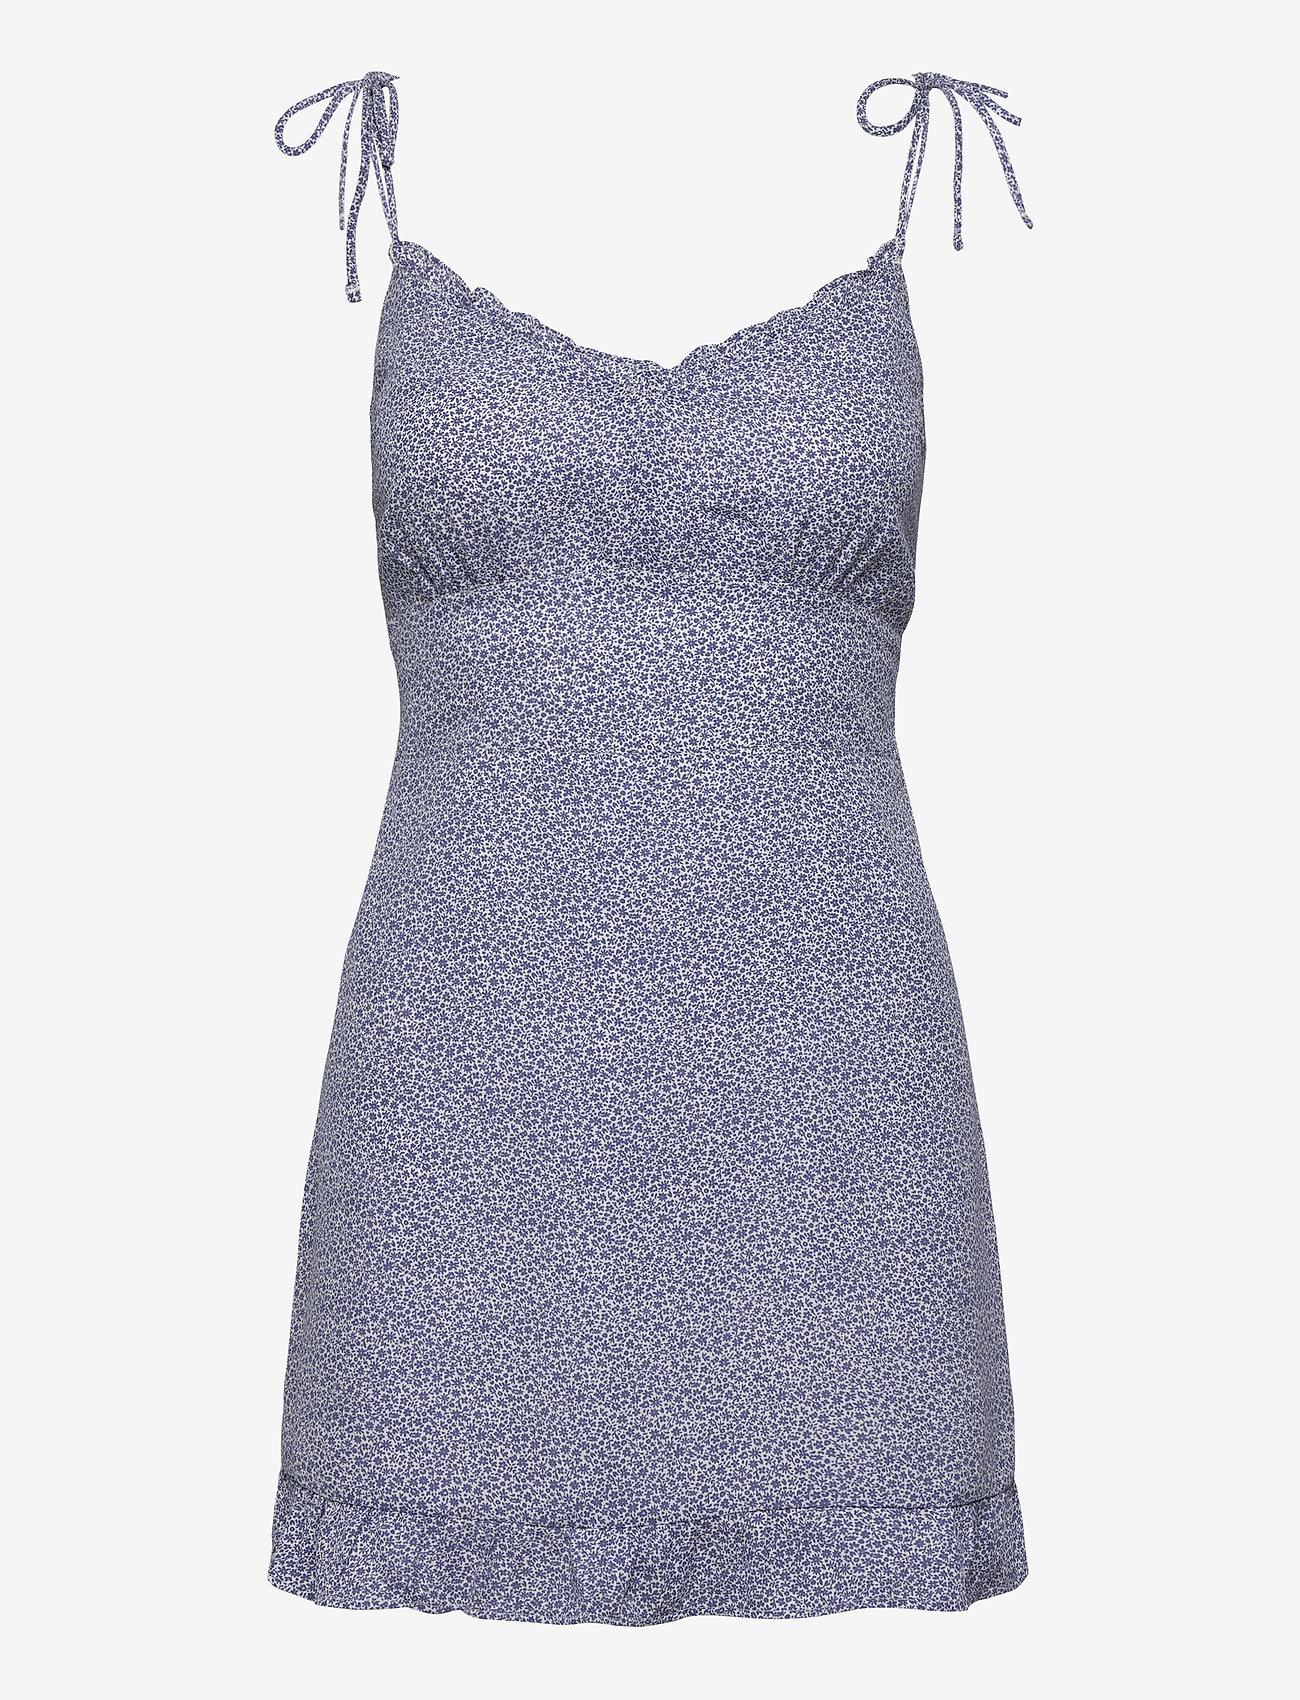 Abercrombie & Fitch - ANF WOMENS DRESSES - sommerkjoler - blue floral - 0